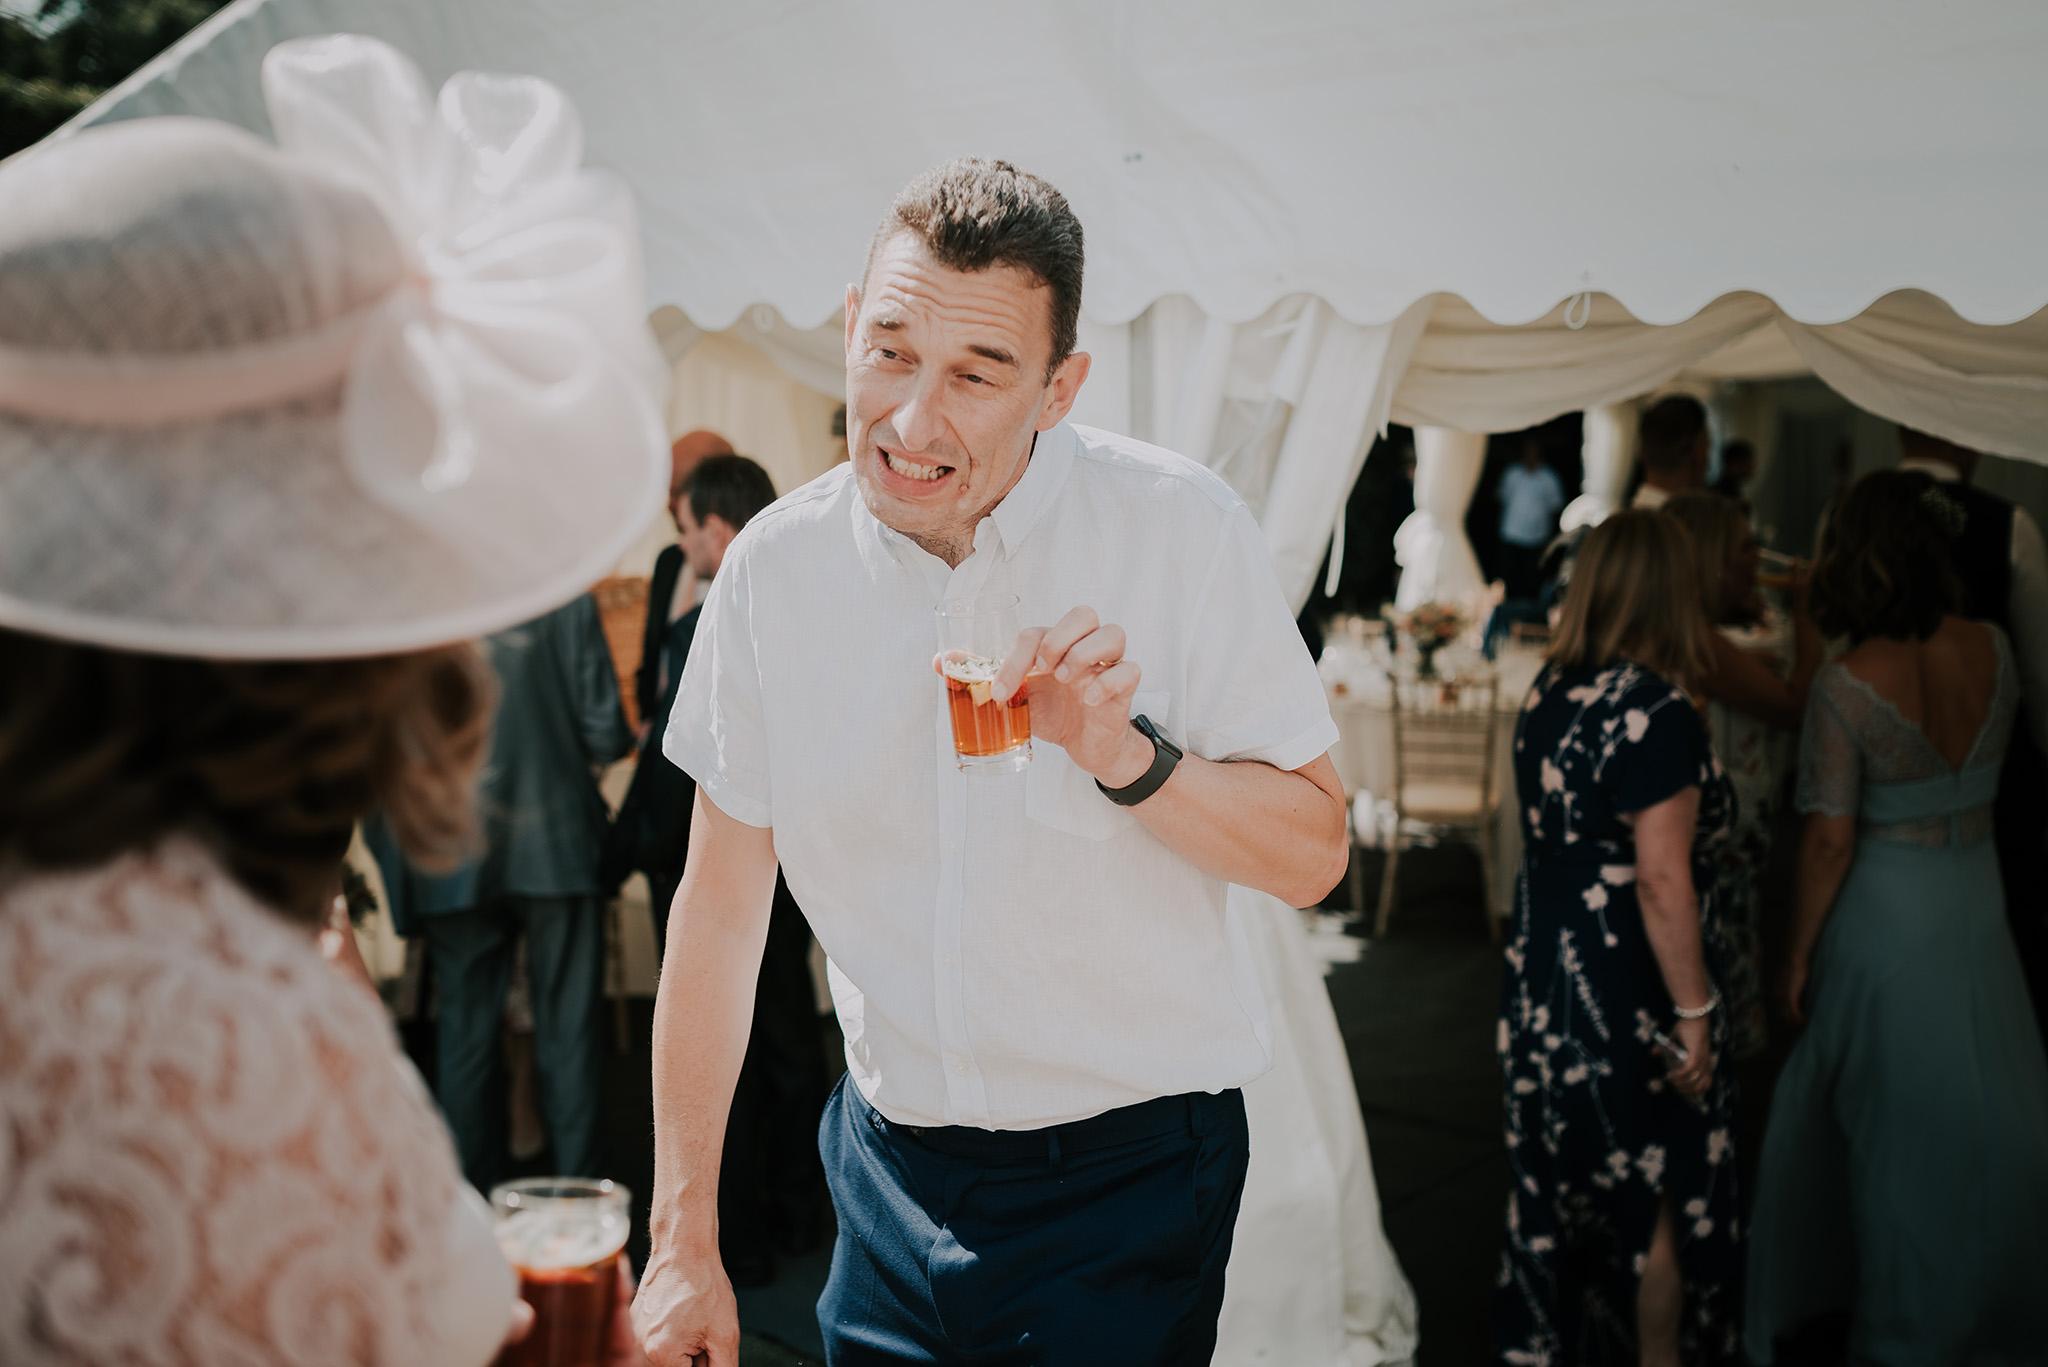 scott-stockwell-photography-wedding-39.jpg